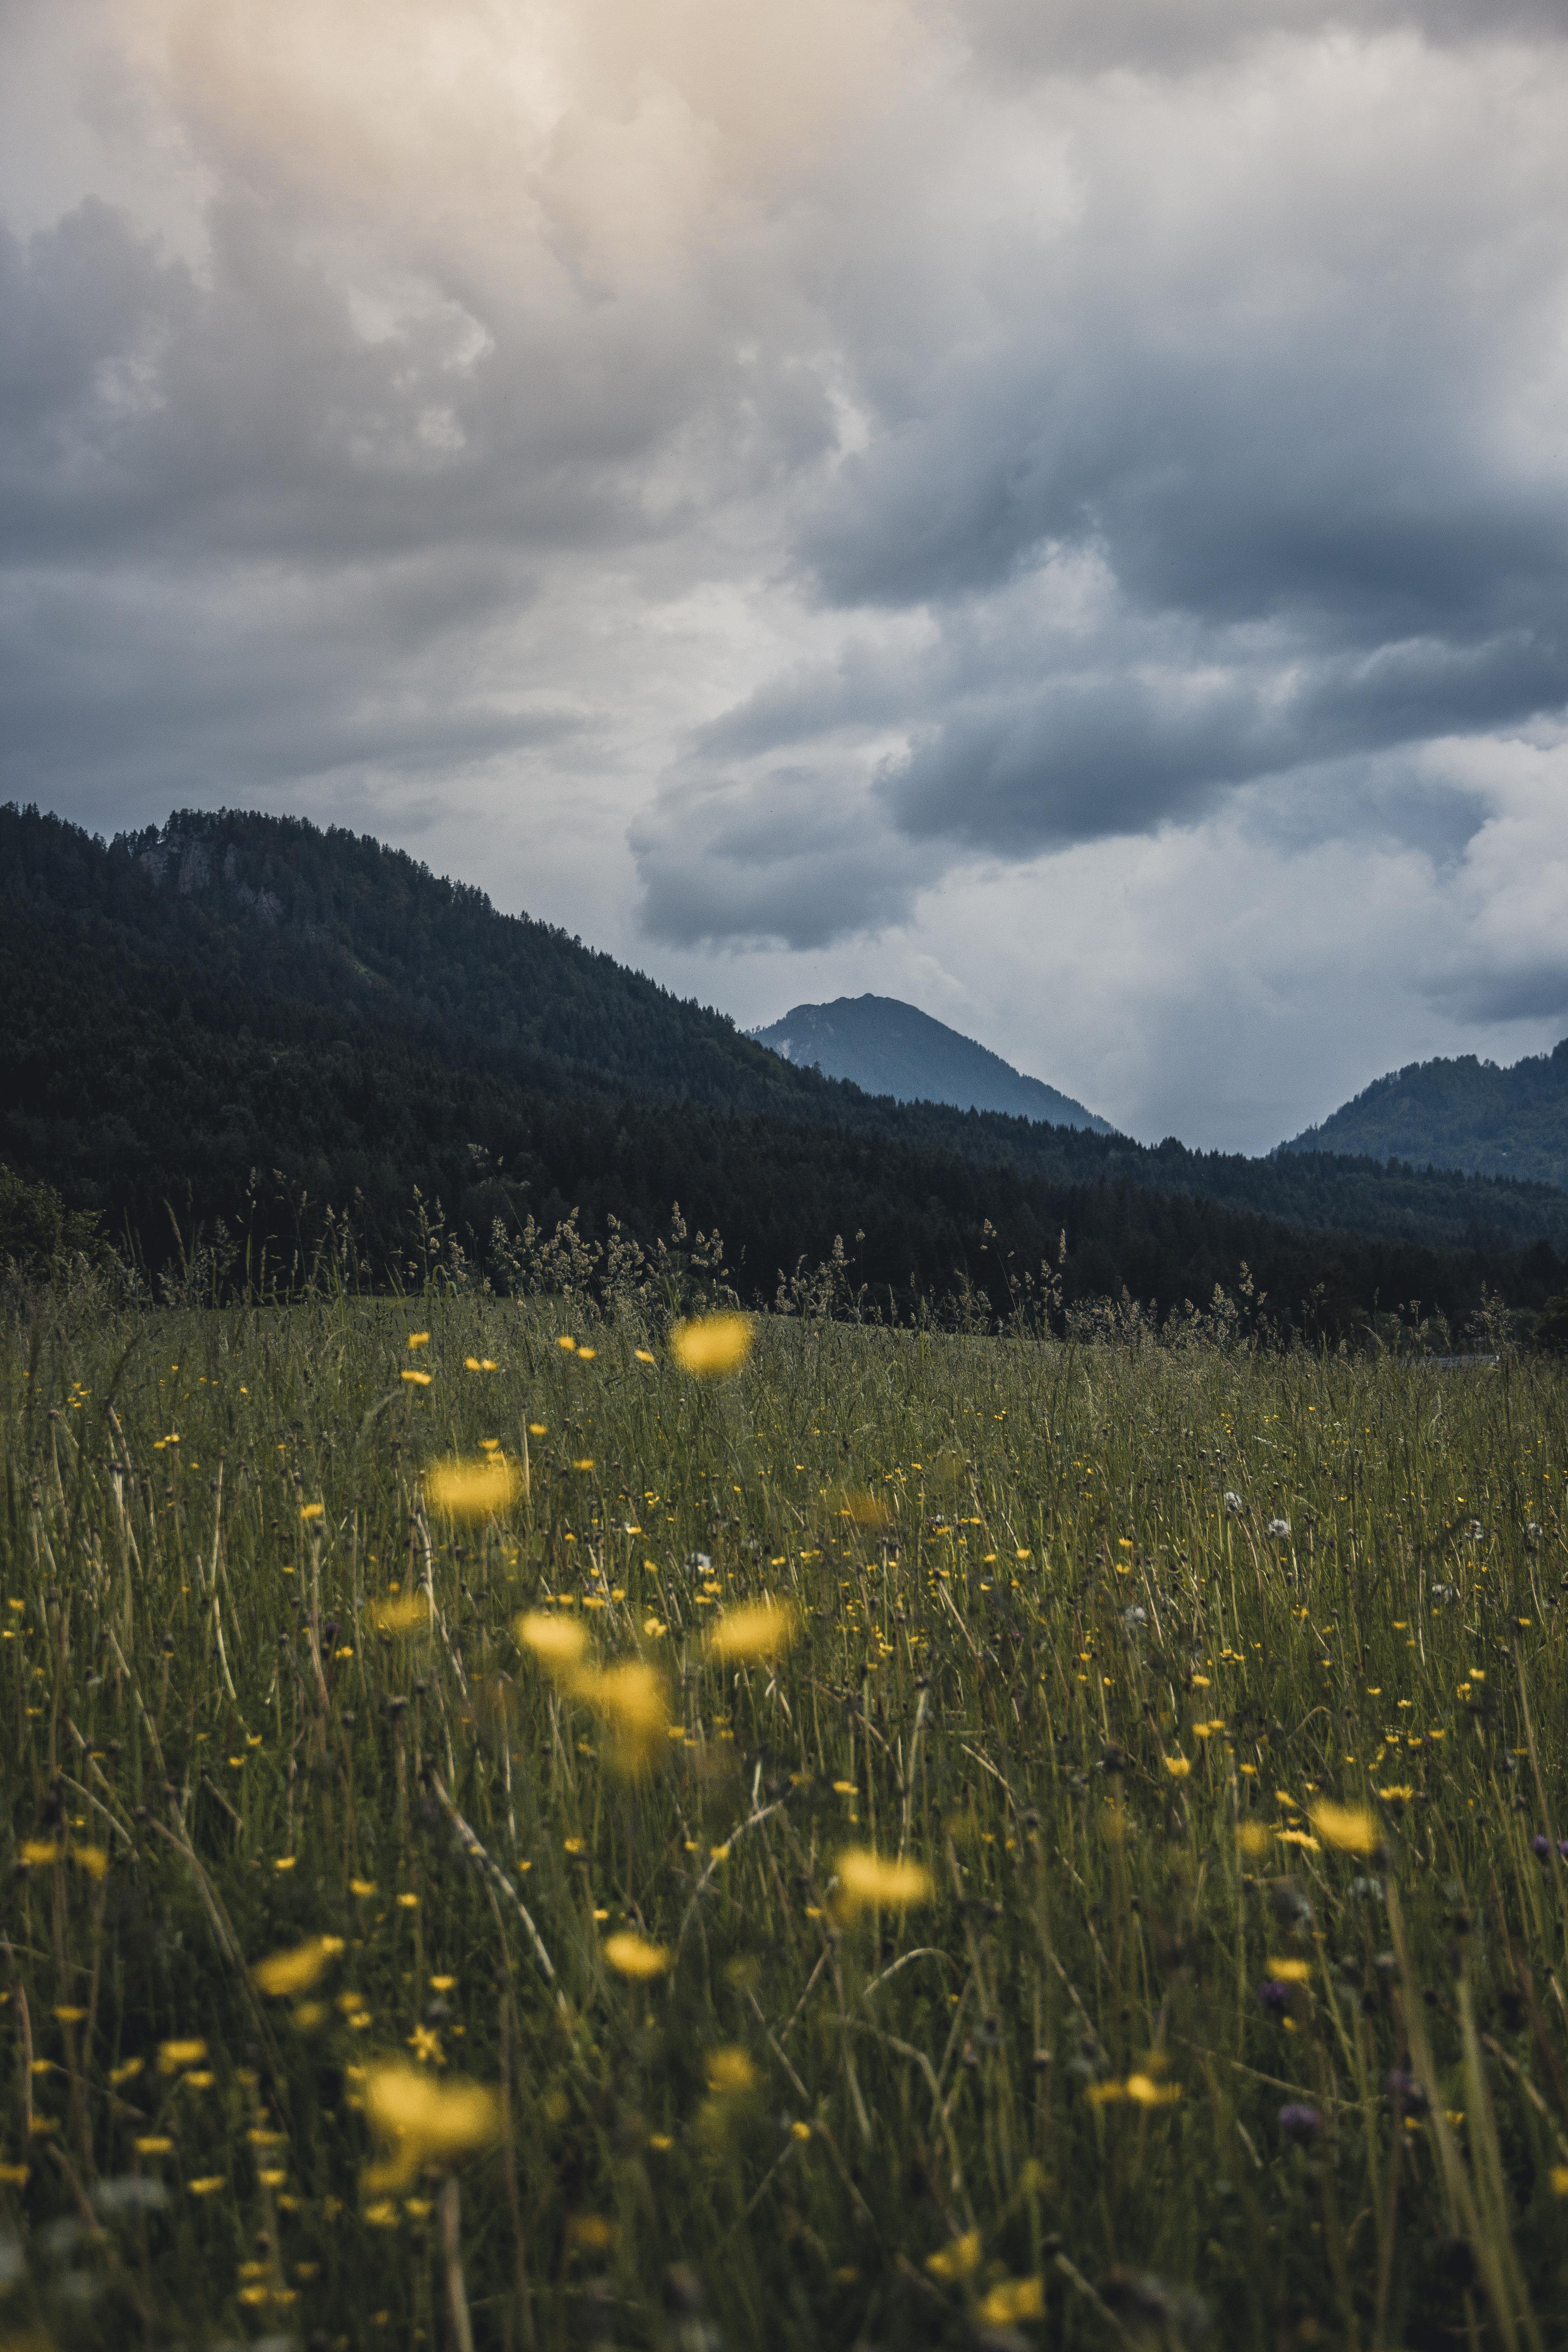 Photo of Flower Field Near Mountains